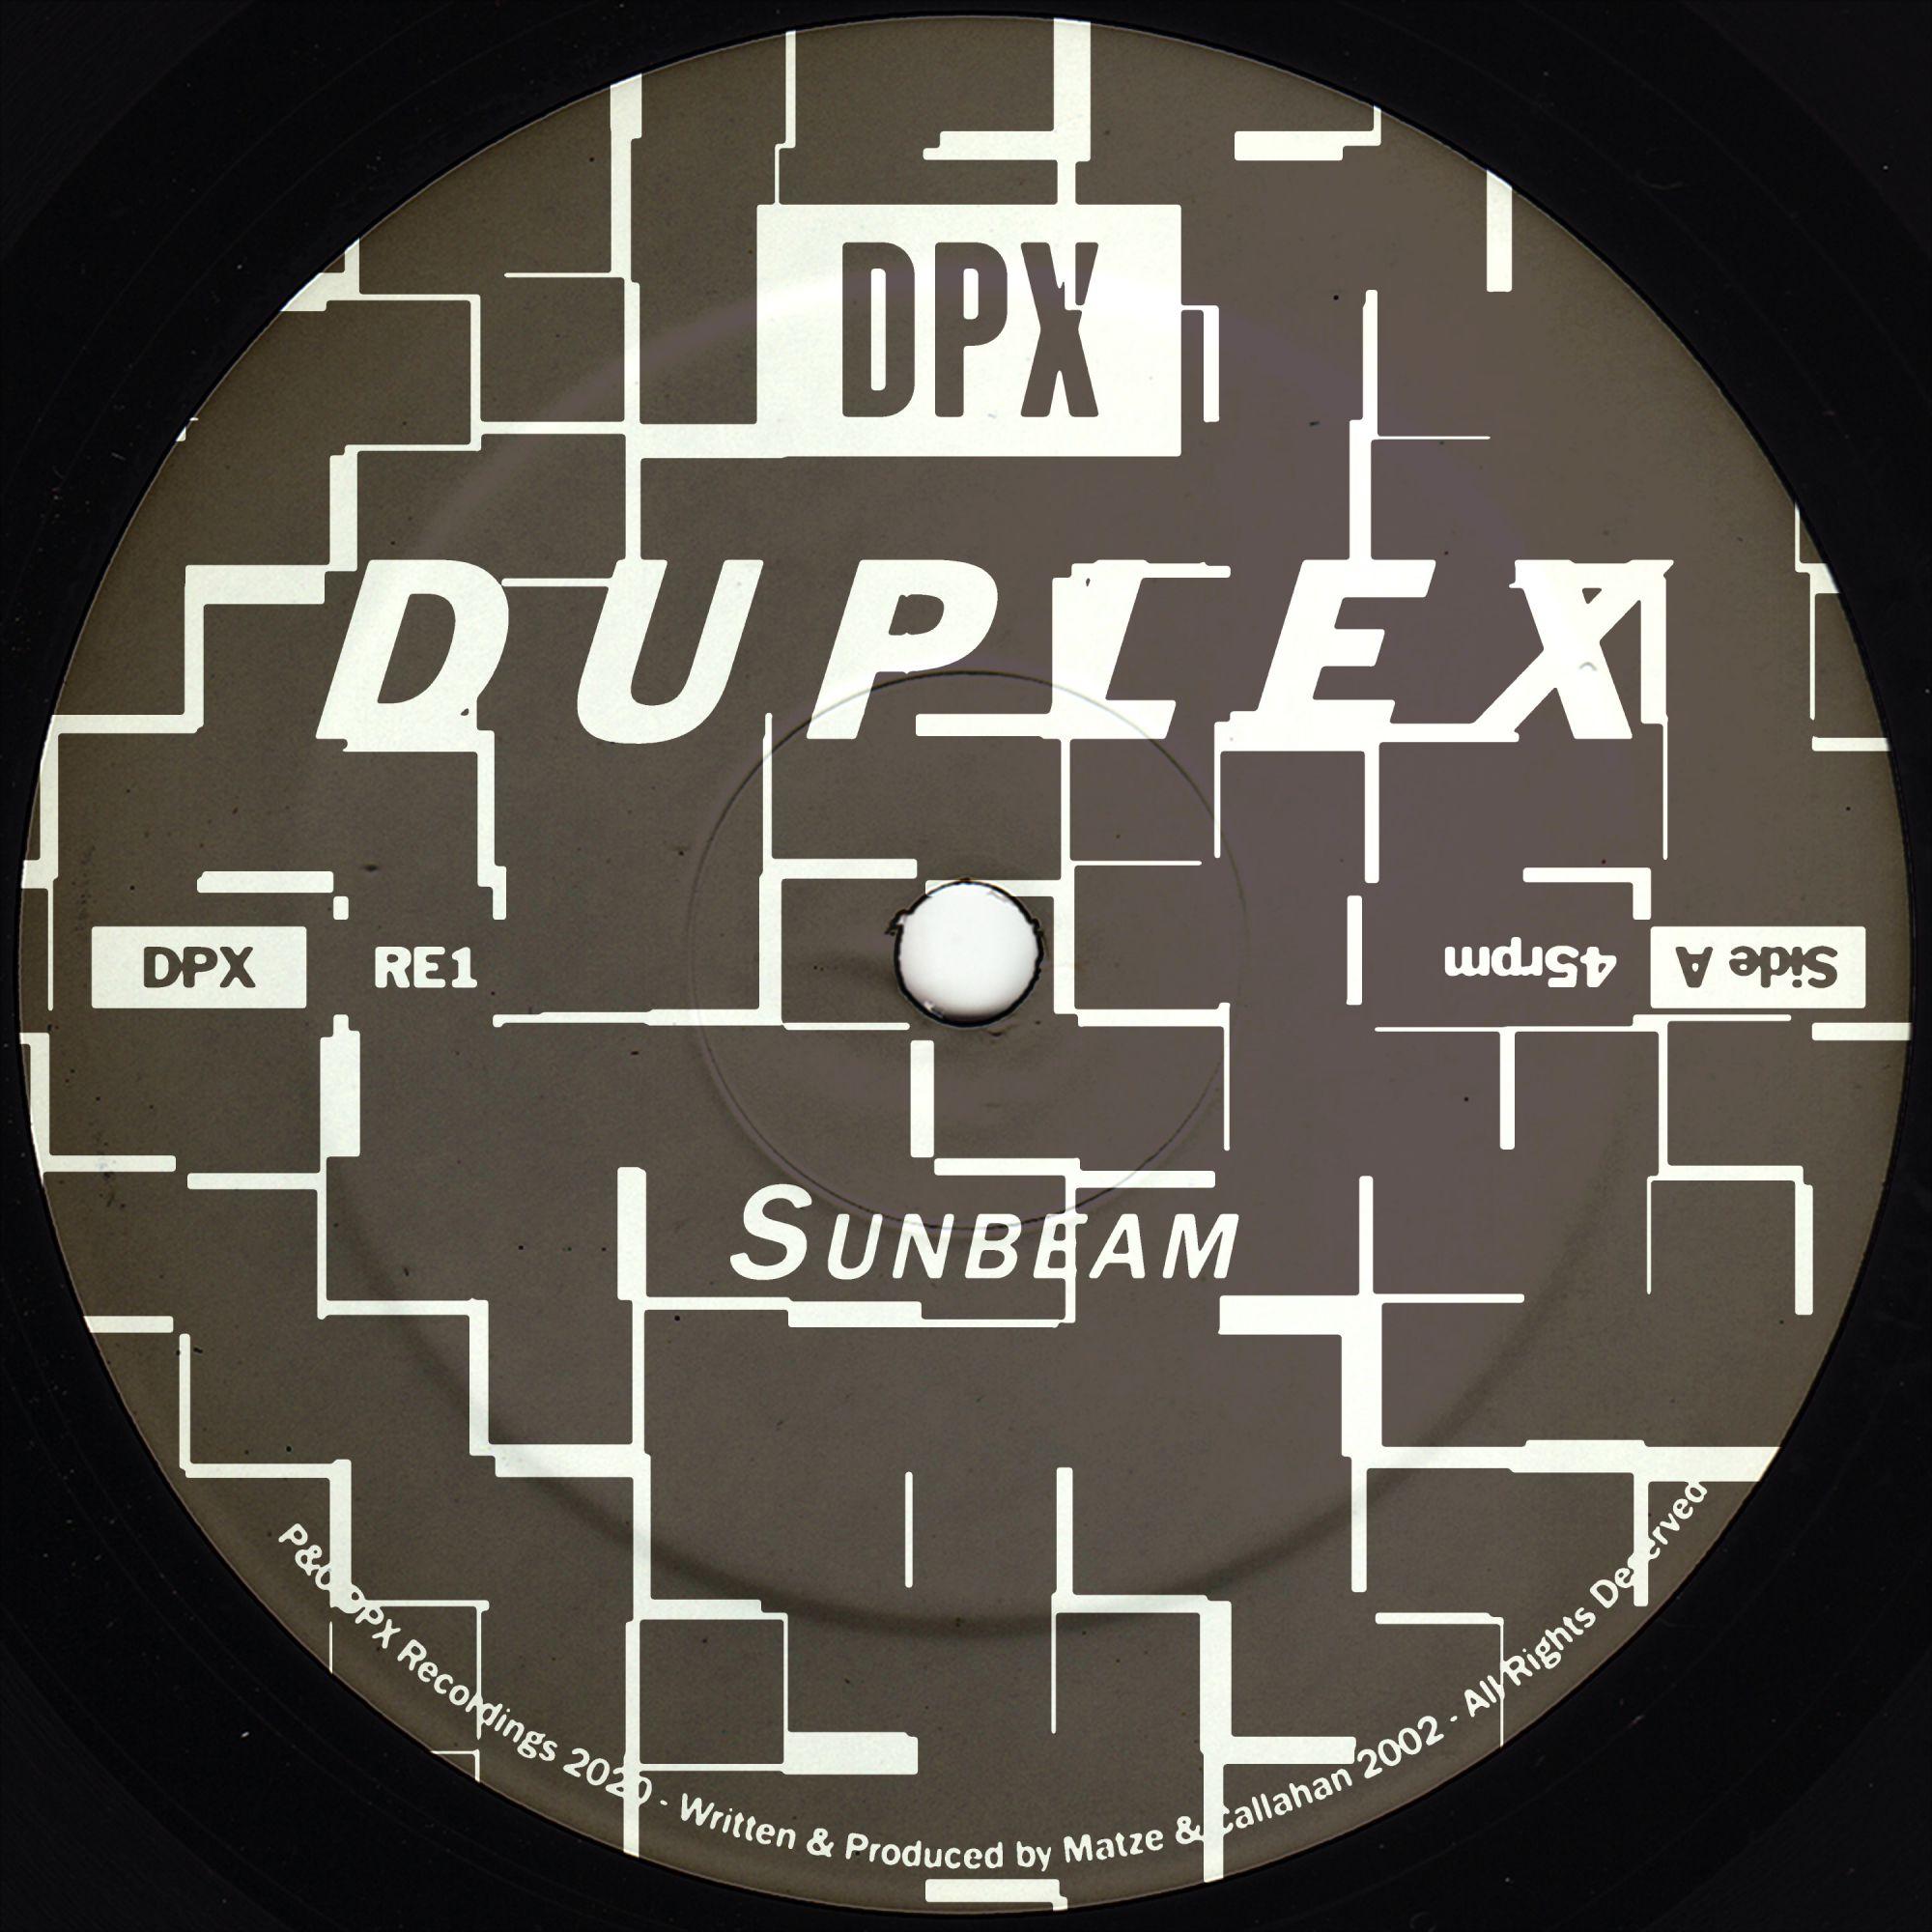 Duplex - Sunbeam